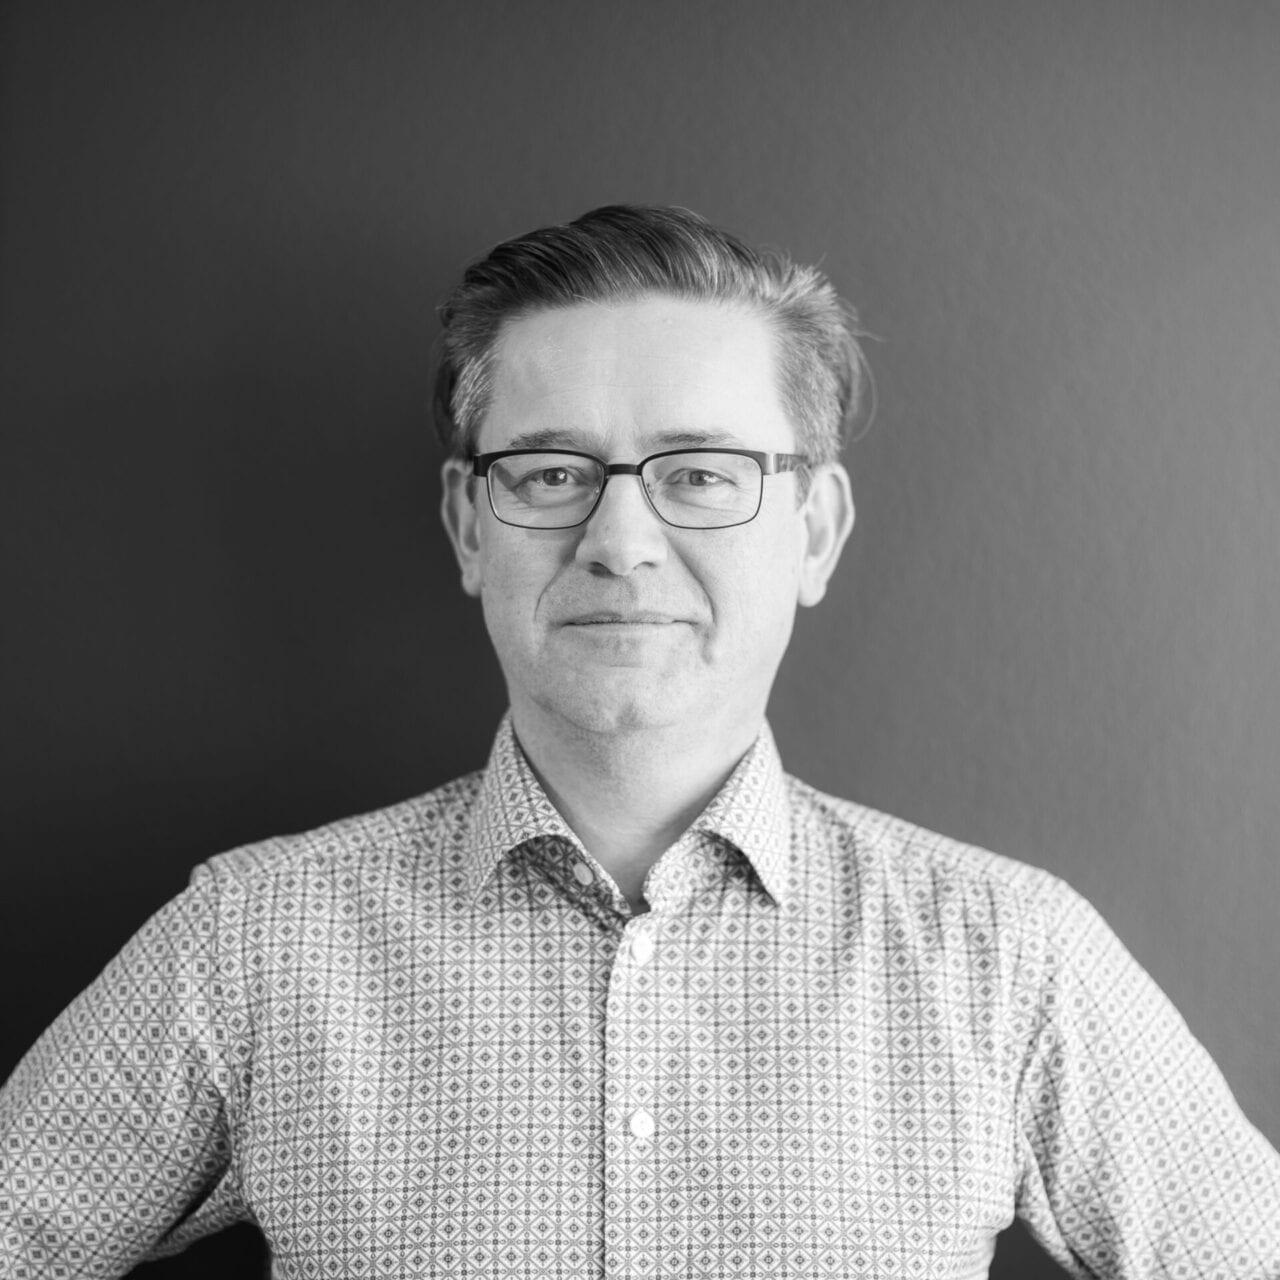 Fred Frivåg